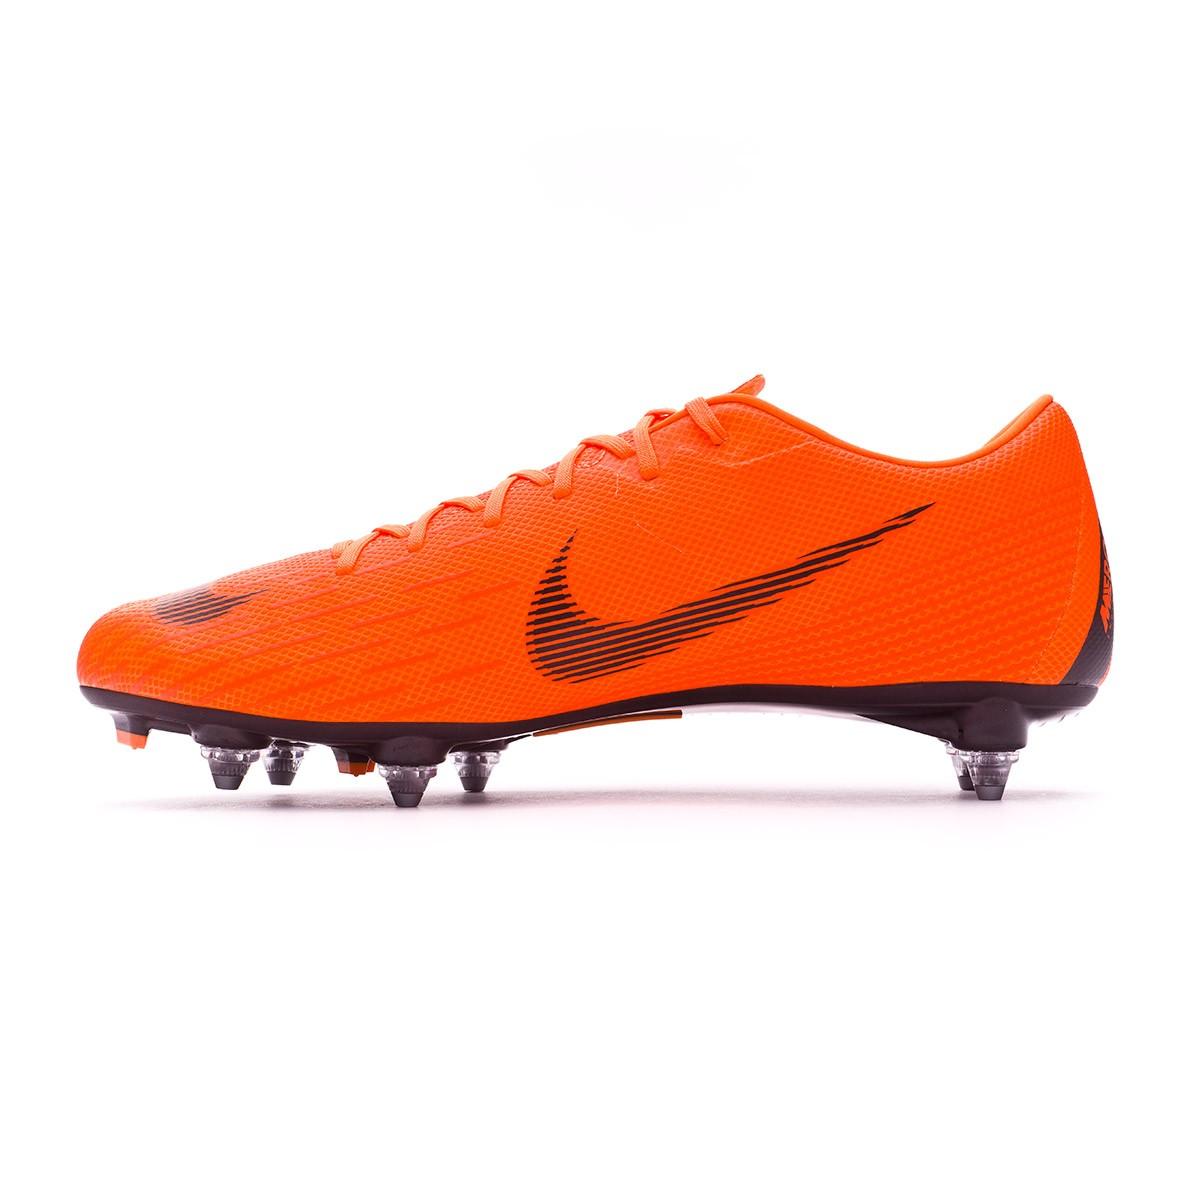 ... Bota Mercurial Vapor XII Academy SG-Pro Total orange-Black-Volt.  Categorías de la Bota de fútbol 4fc3c43894e6f